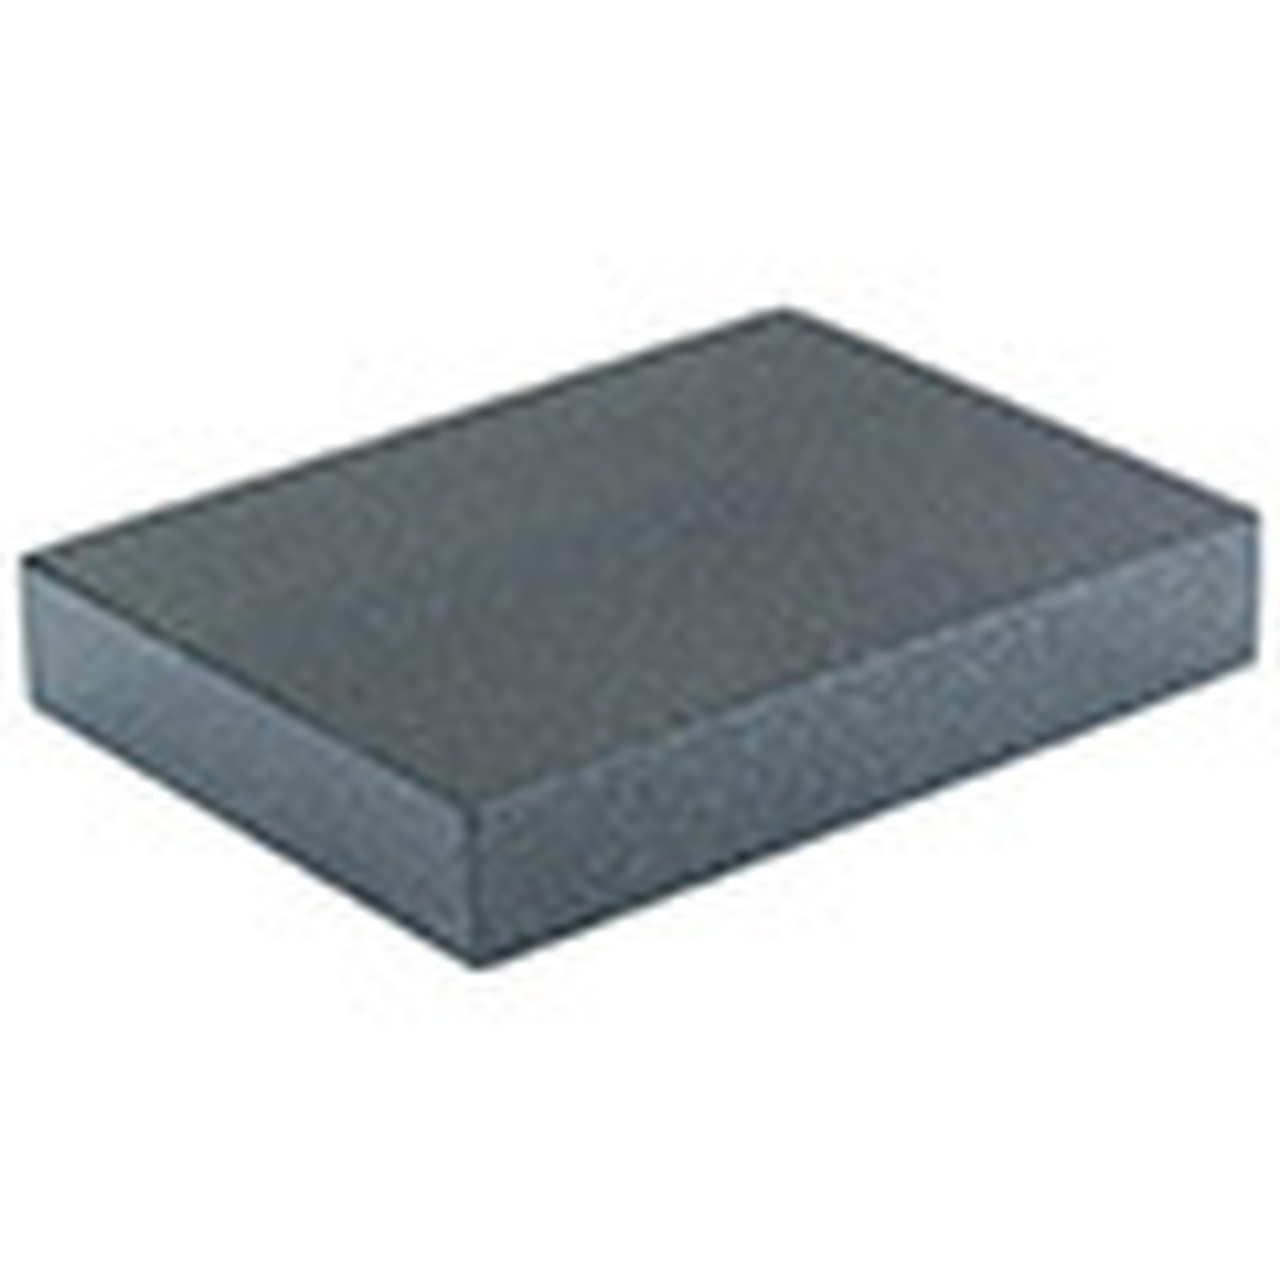 Granite Surface Plates image